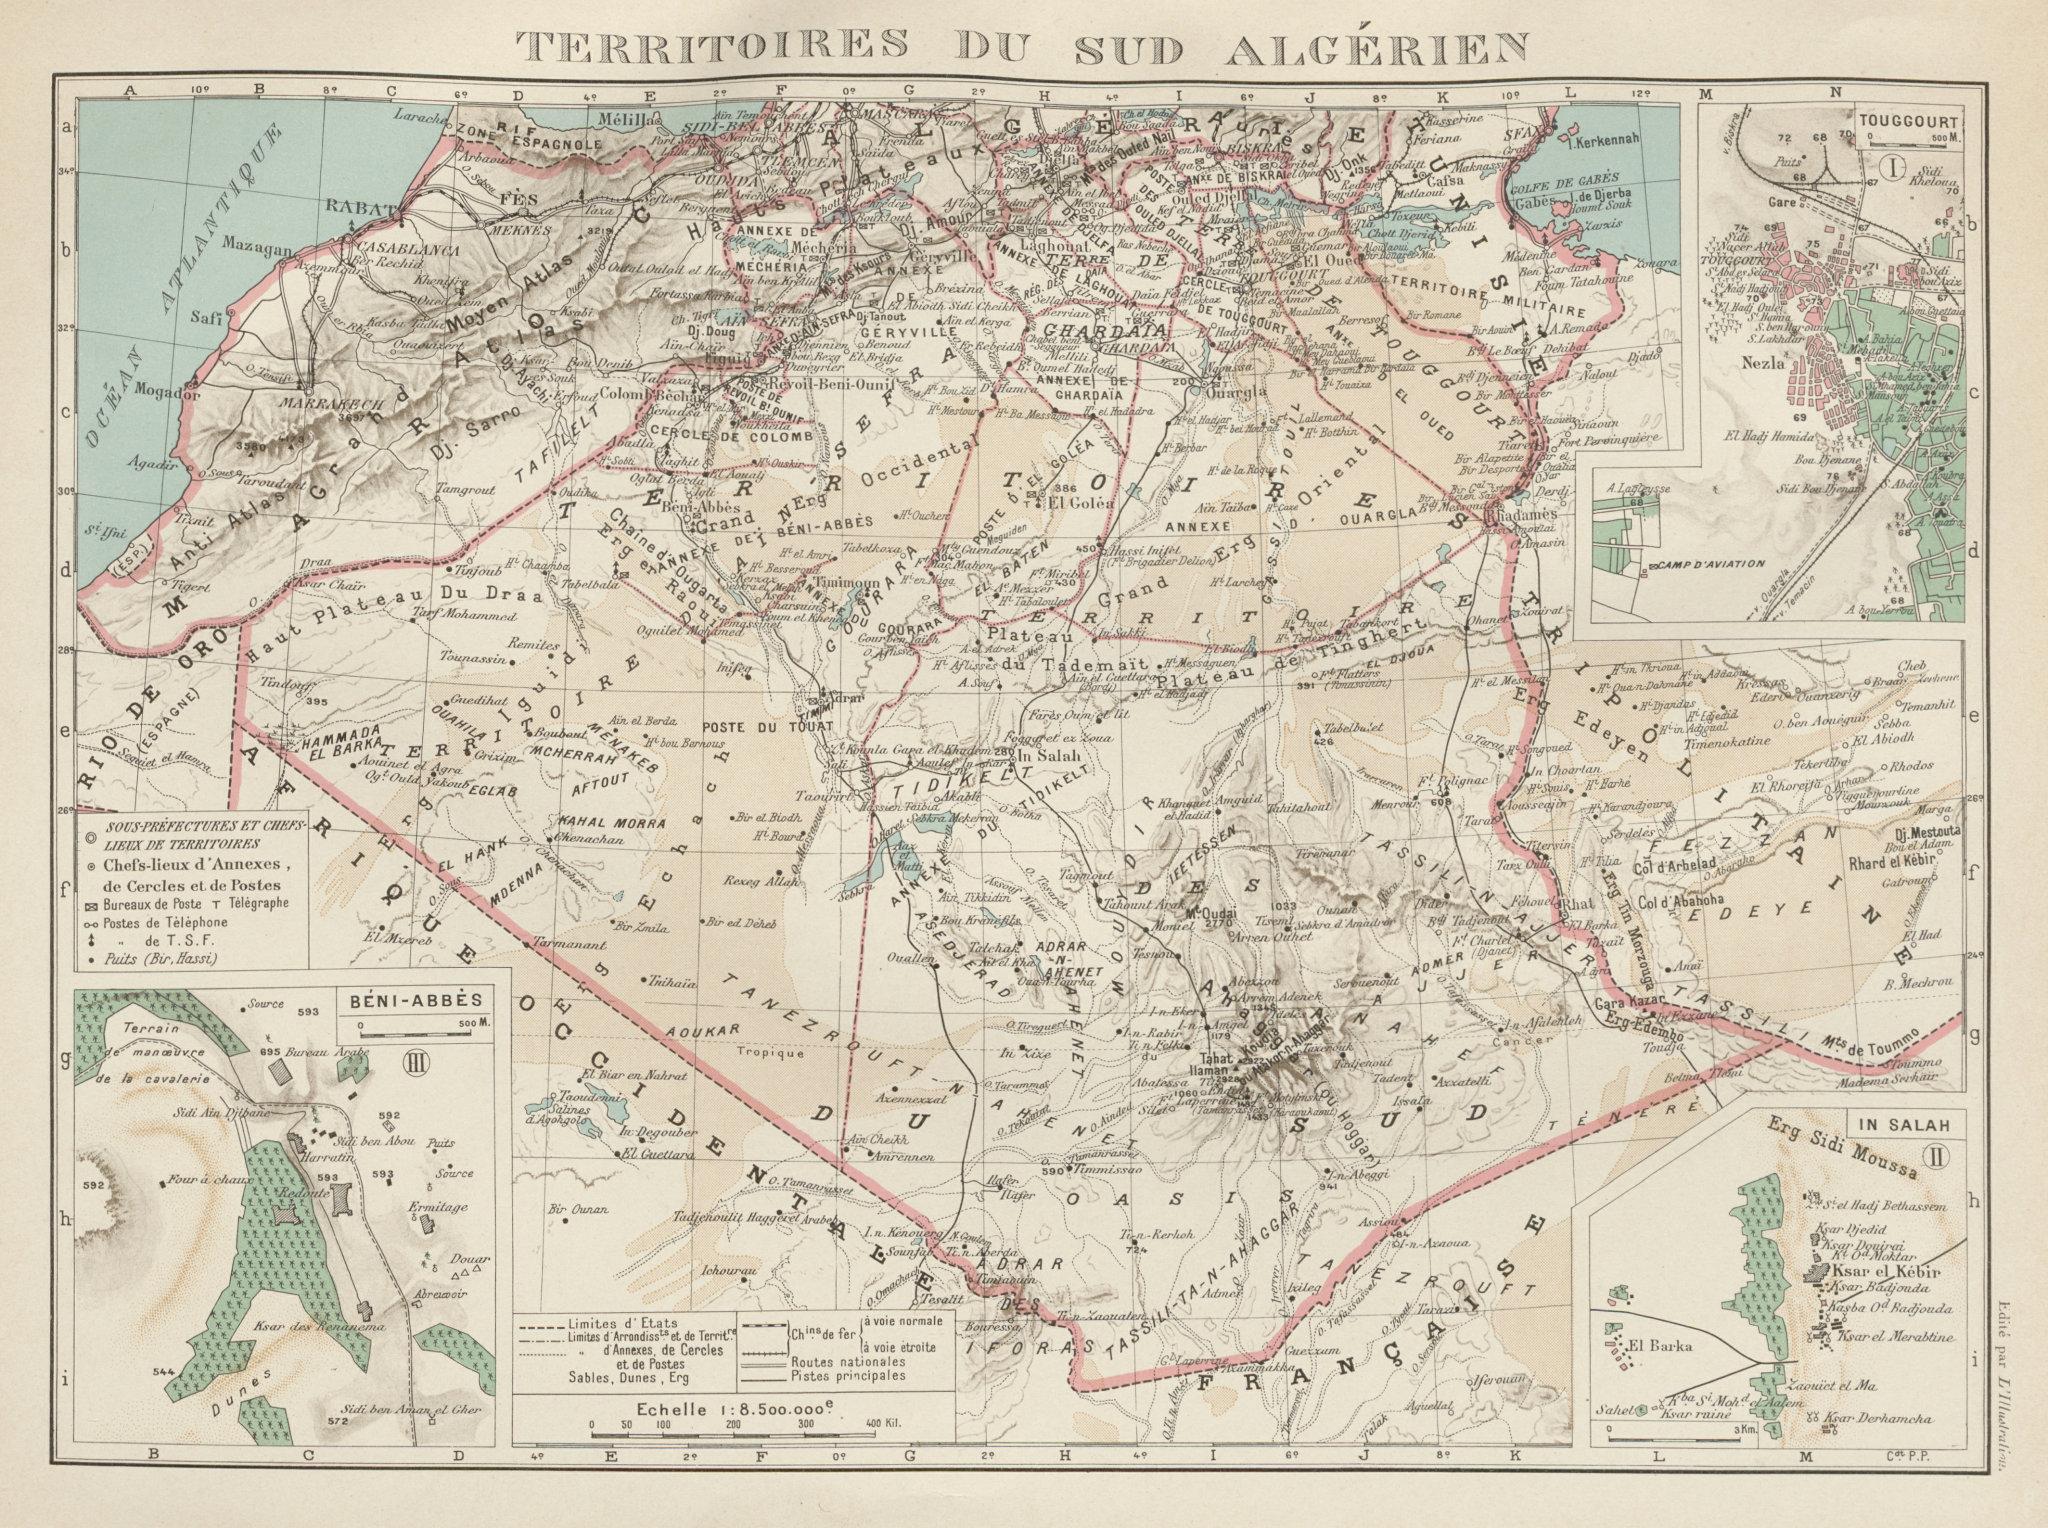 Associate Product FRENCH ALGERIA. Territoires sud Algerien. Béni-Abbès Touggourt In Salah 1929 map